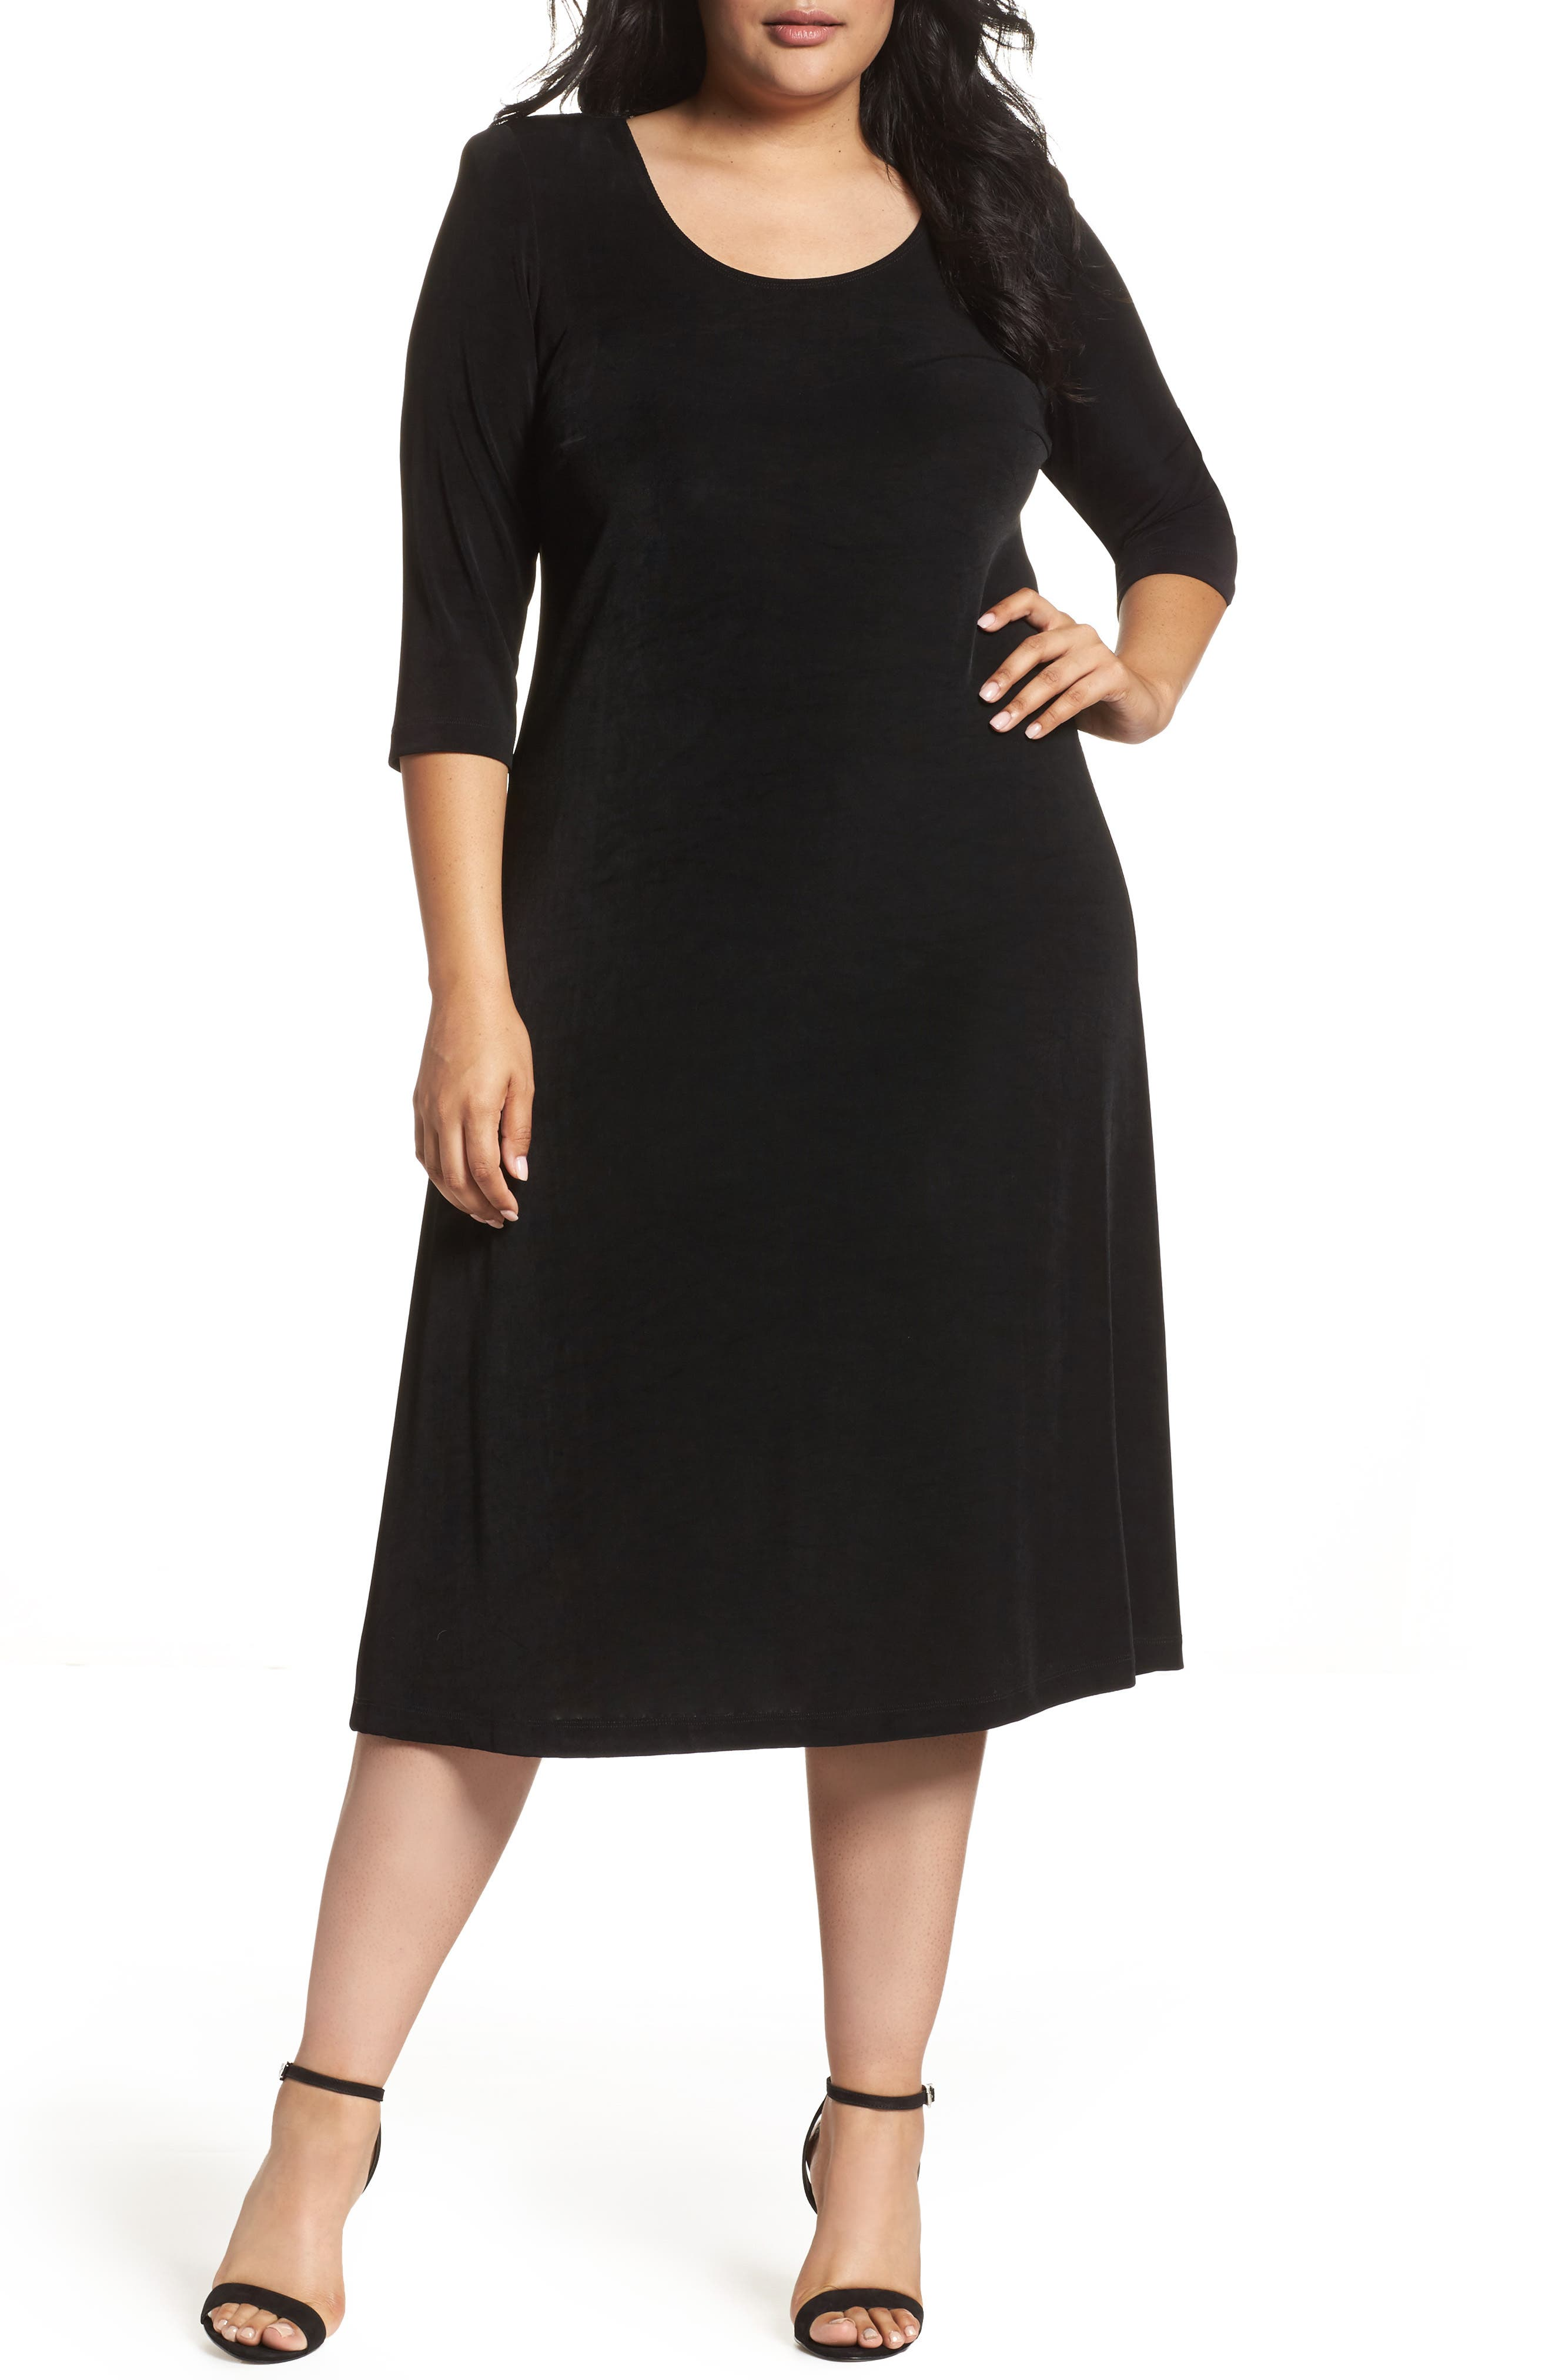 Main Image - Vikki Vi Three-Quarter Sleeve Stretch Knit A-Line Dress (Plus Size)